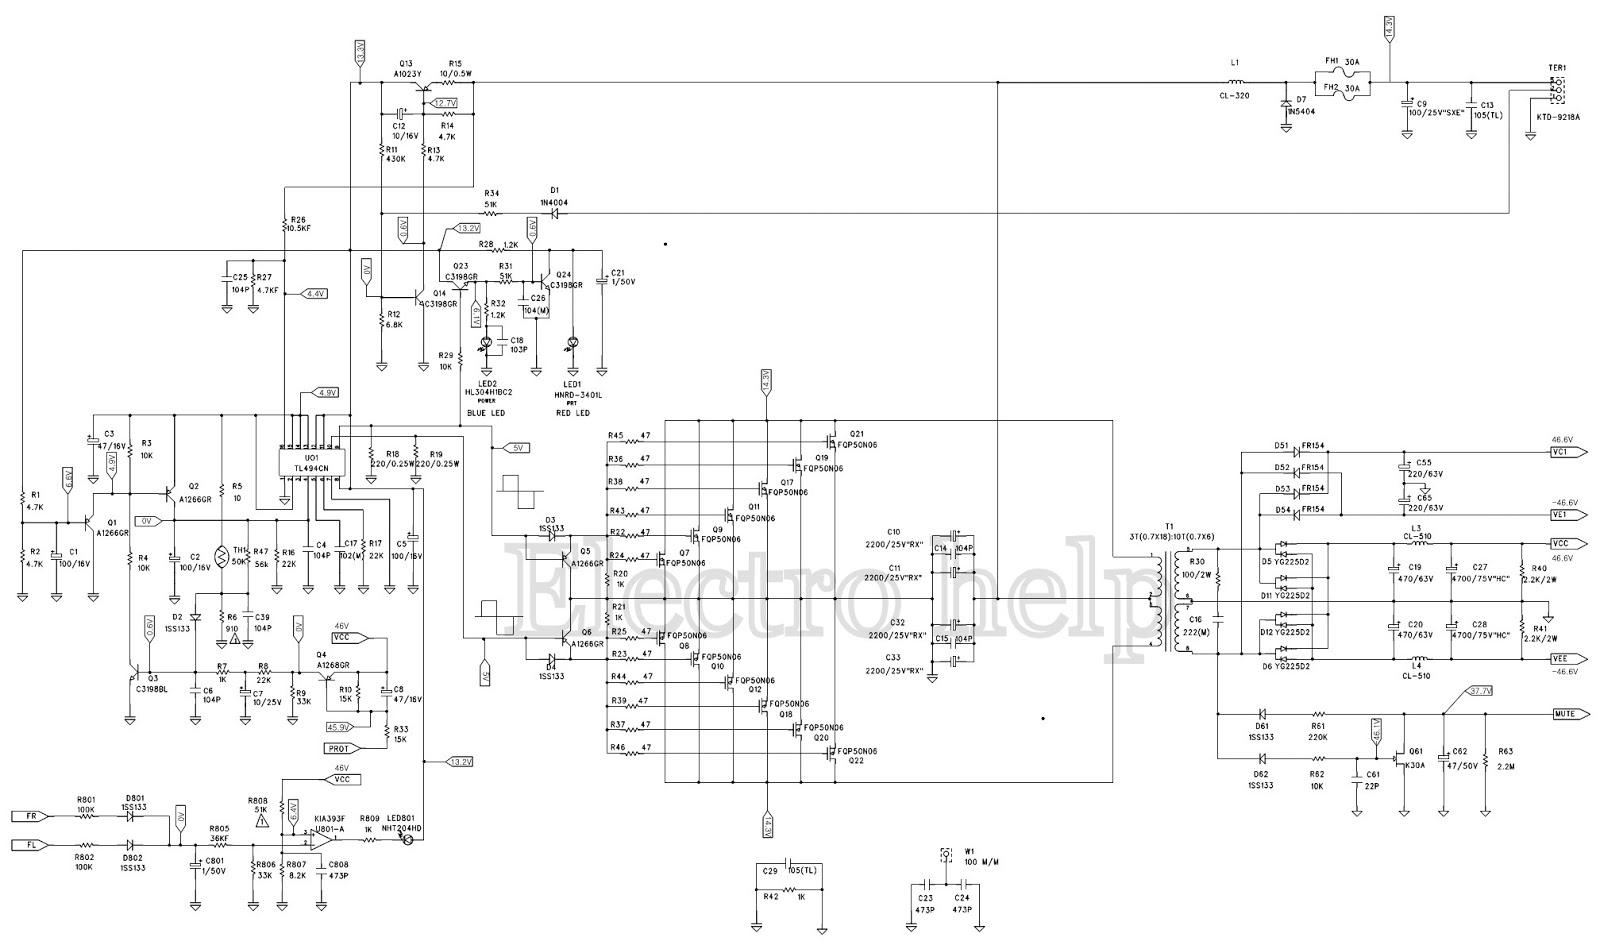 Jbl 86280-af013 Wiring Diagram